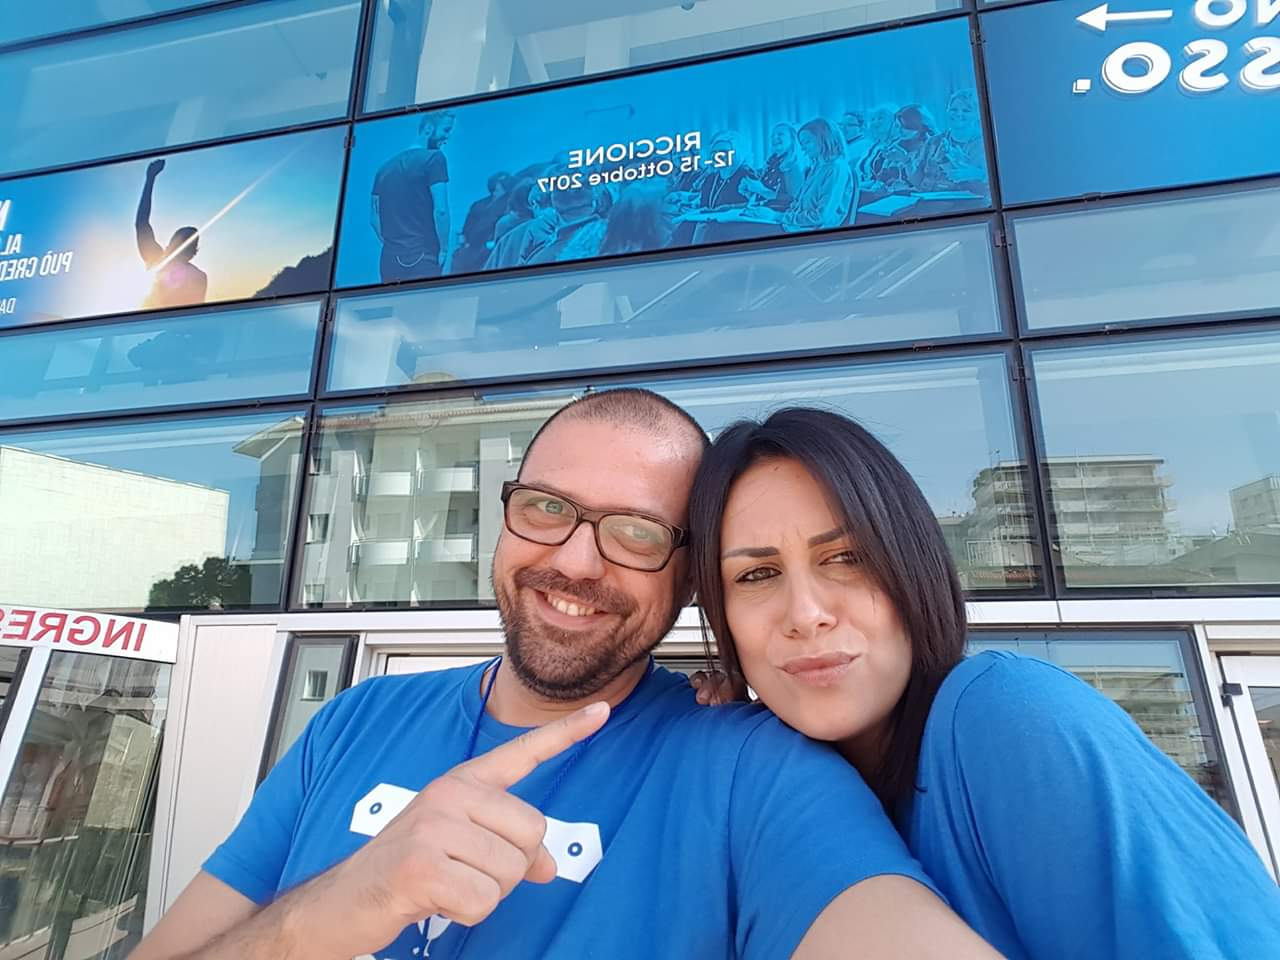 Duolife_2019_corrado_cavarra_networker_sicilia_italia5